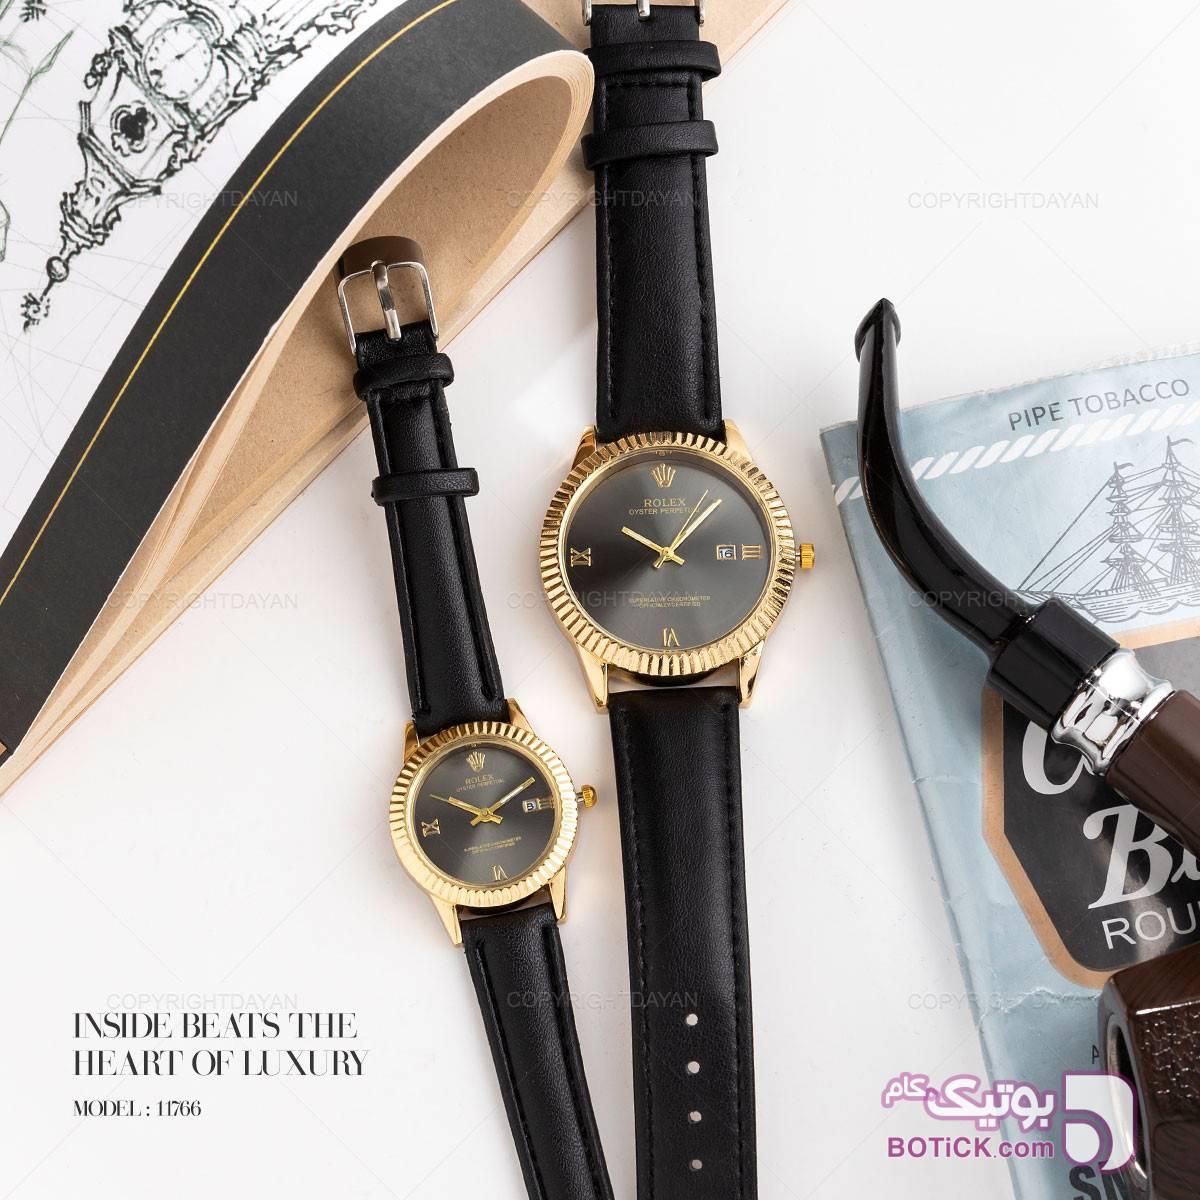 ست ساعت مچی Rolex مدل 11766 زرد ساعت